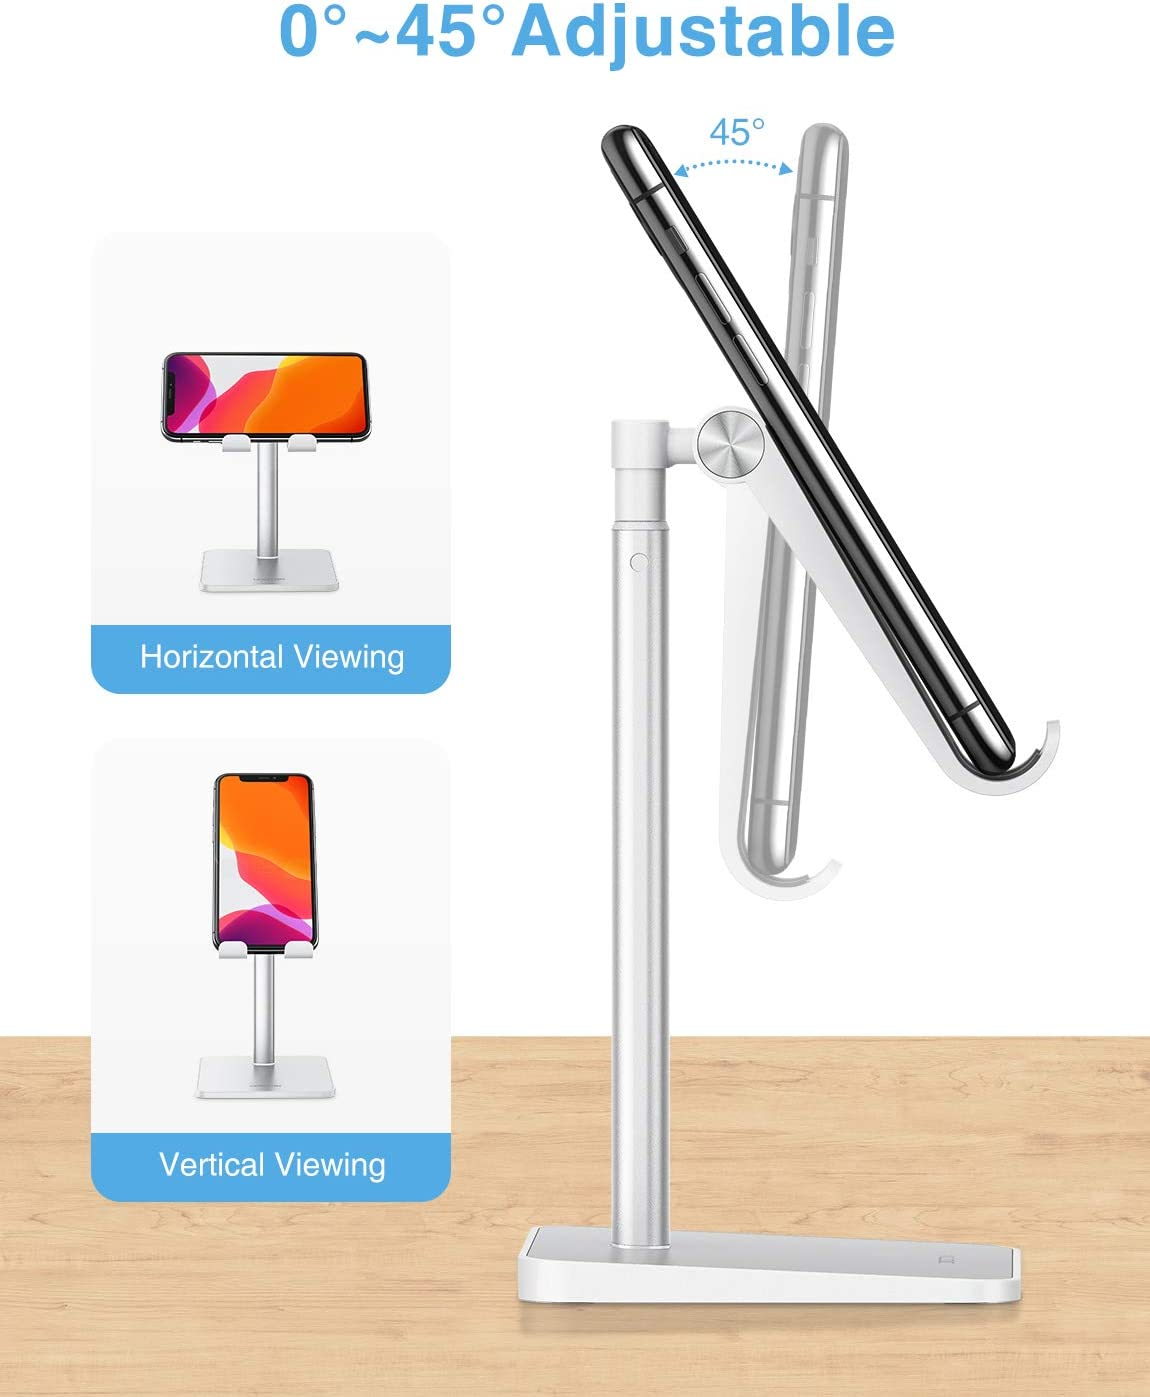 OMOTON Soporte M/óvil Mesa para iPhone 11//XR//Samsung S20// Huawei P40// Xiaomi Mi10 Universal Multi/ángulo Soporte Tel/éfono Ajustable para Smartphone Blanco